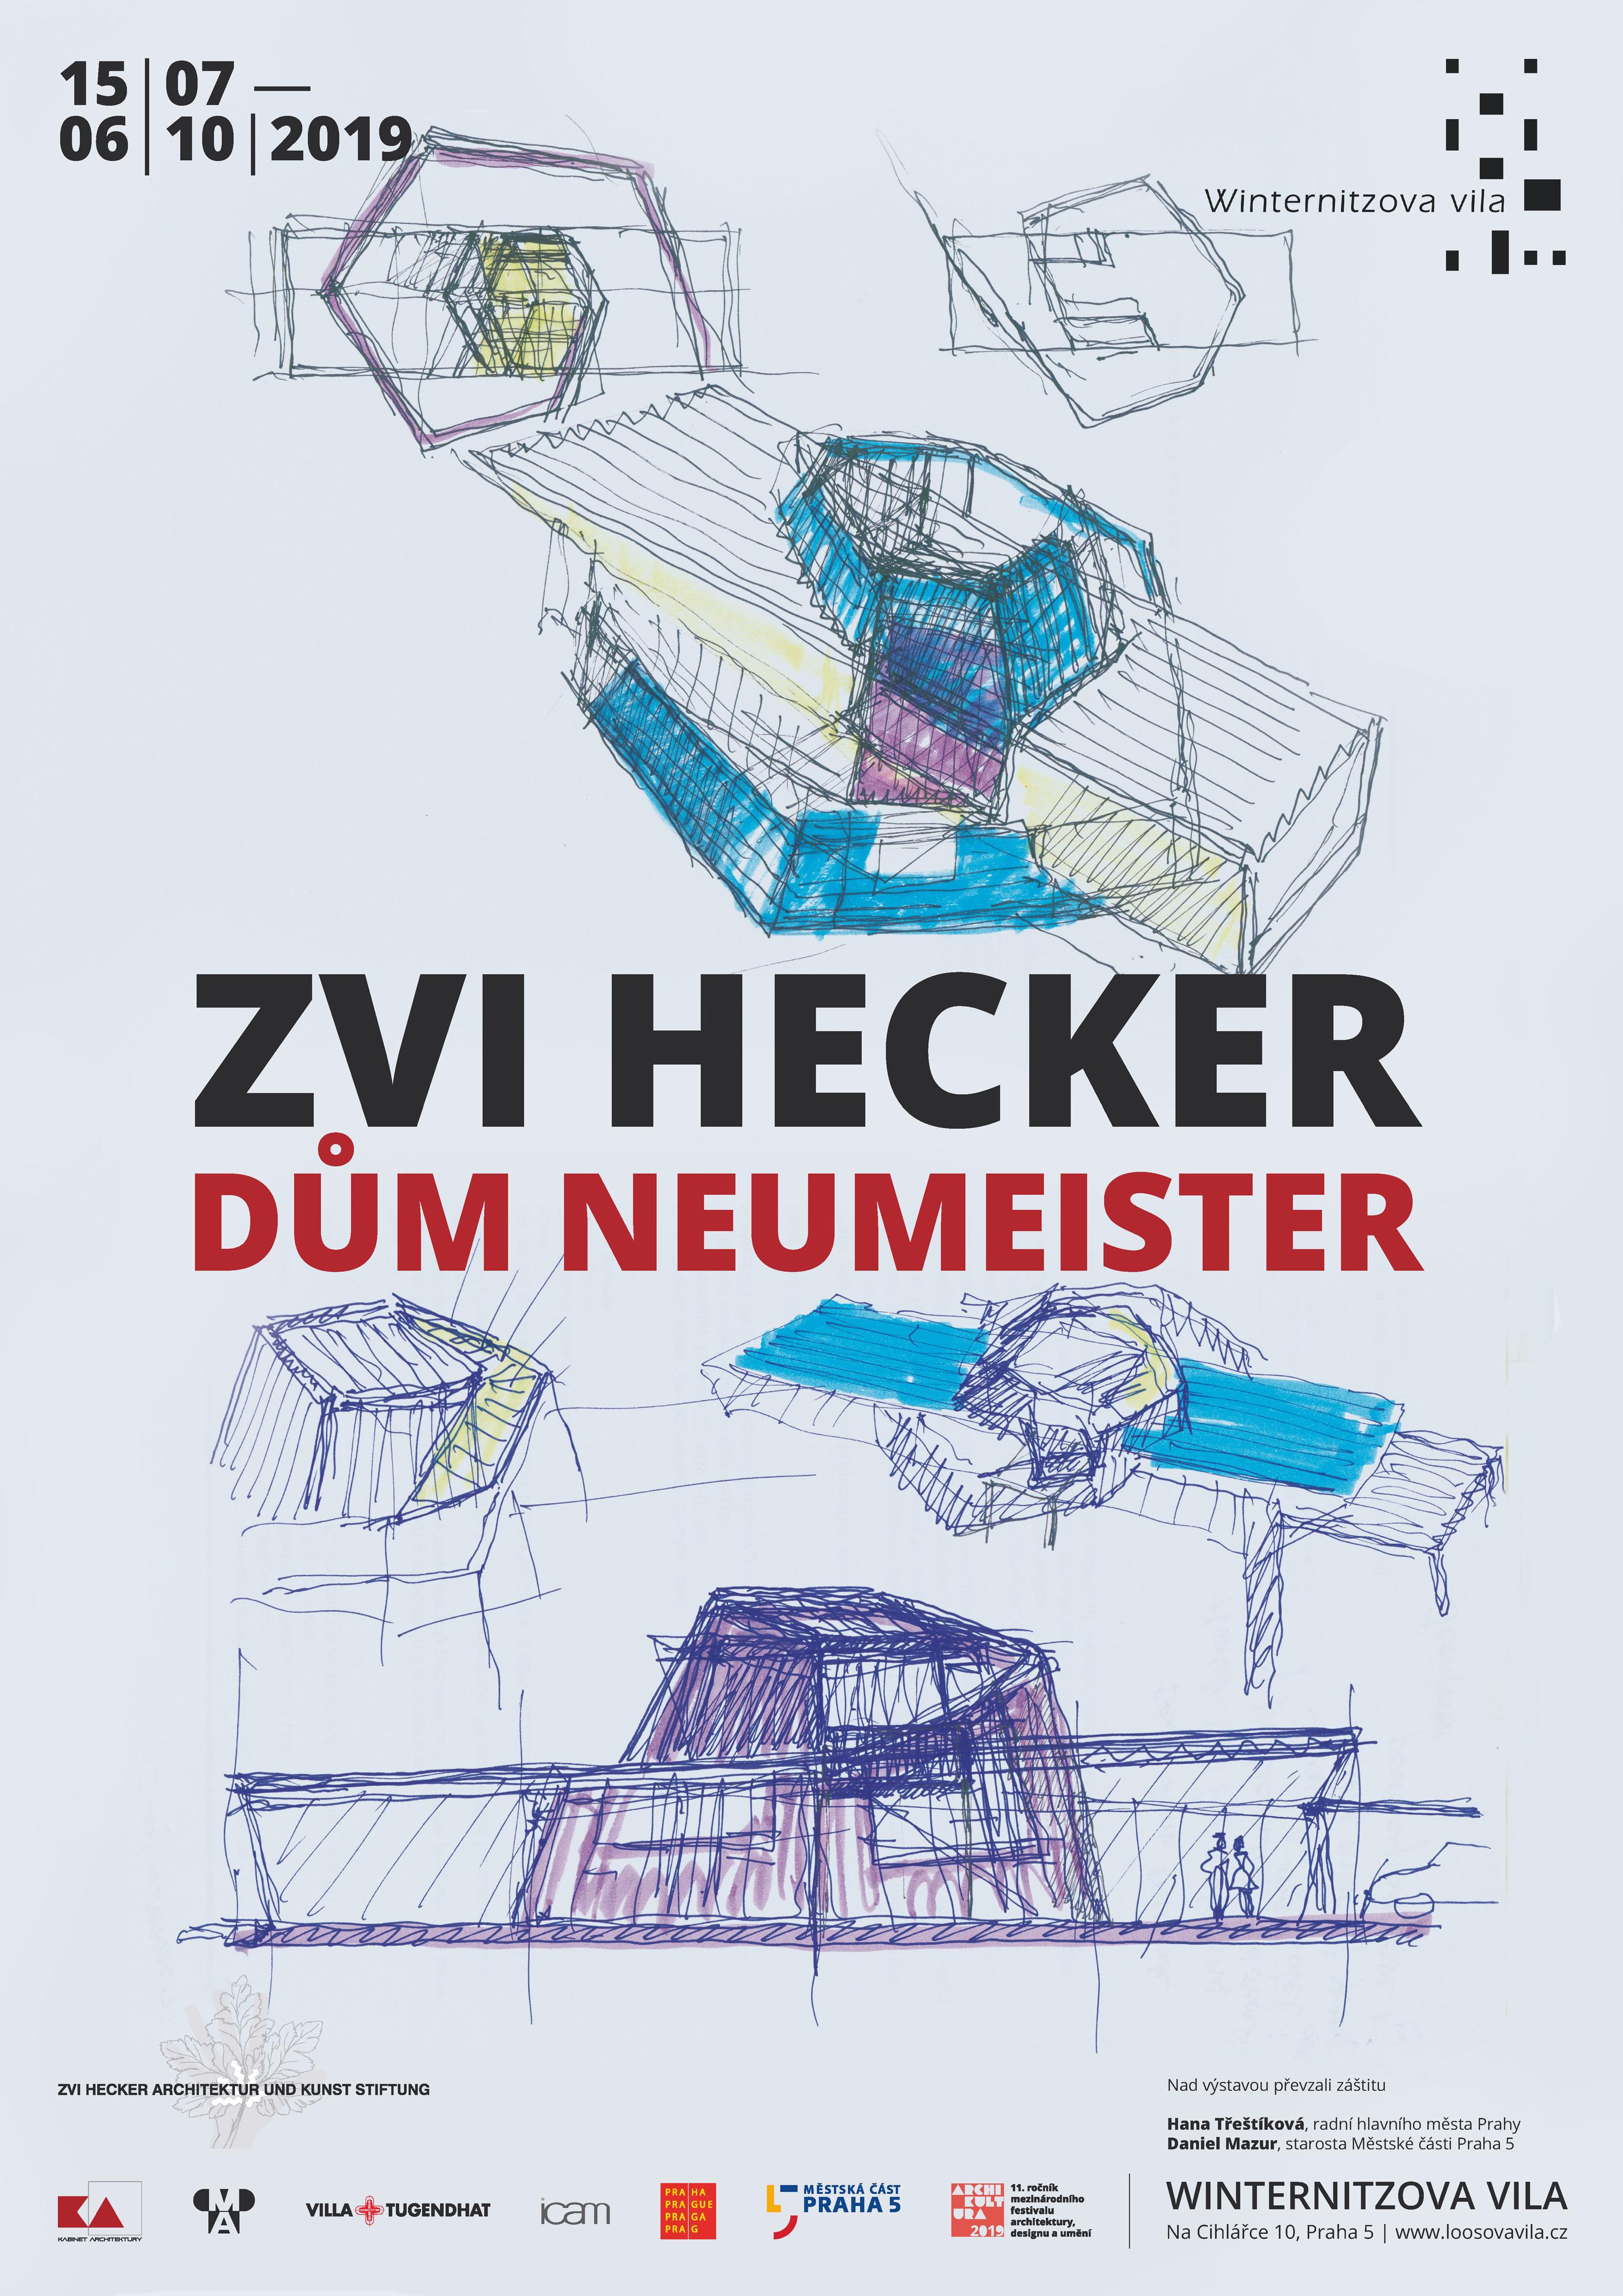 winternitzova-vila-predstavuje-unikatni-vystavu-dum-neumeister